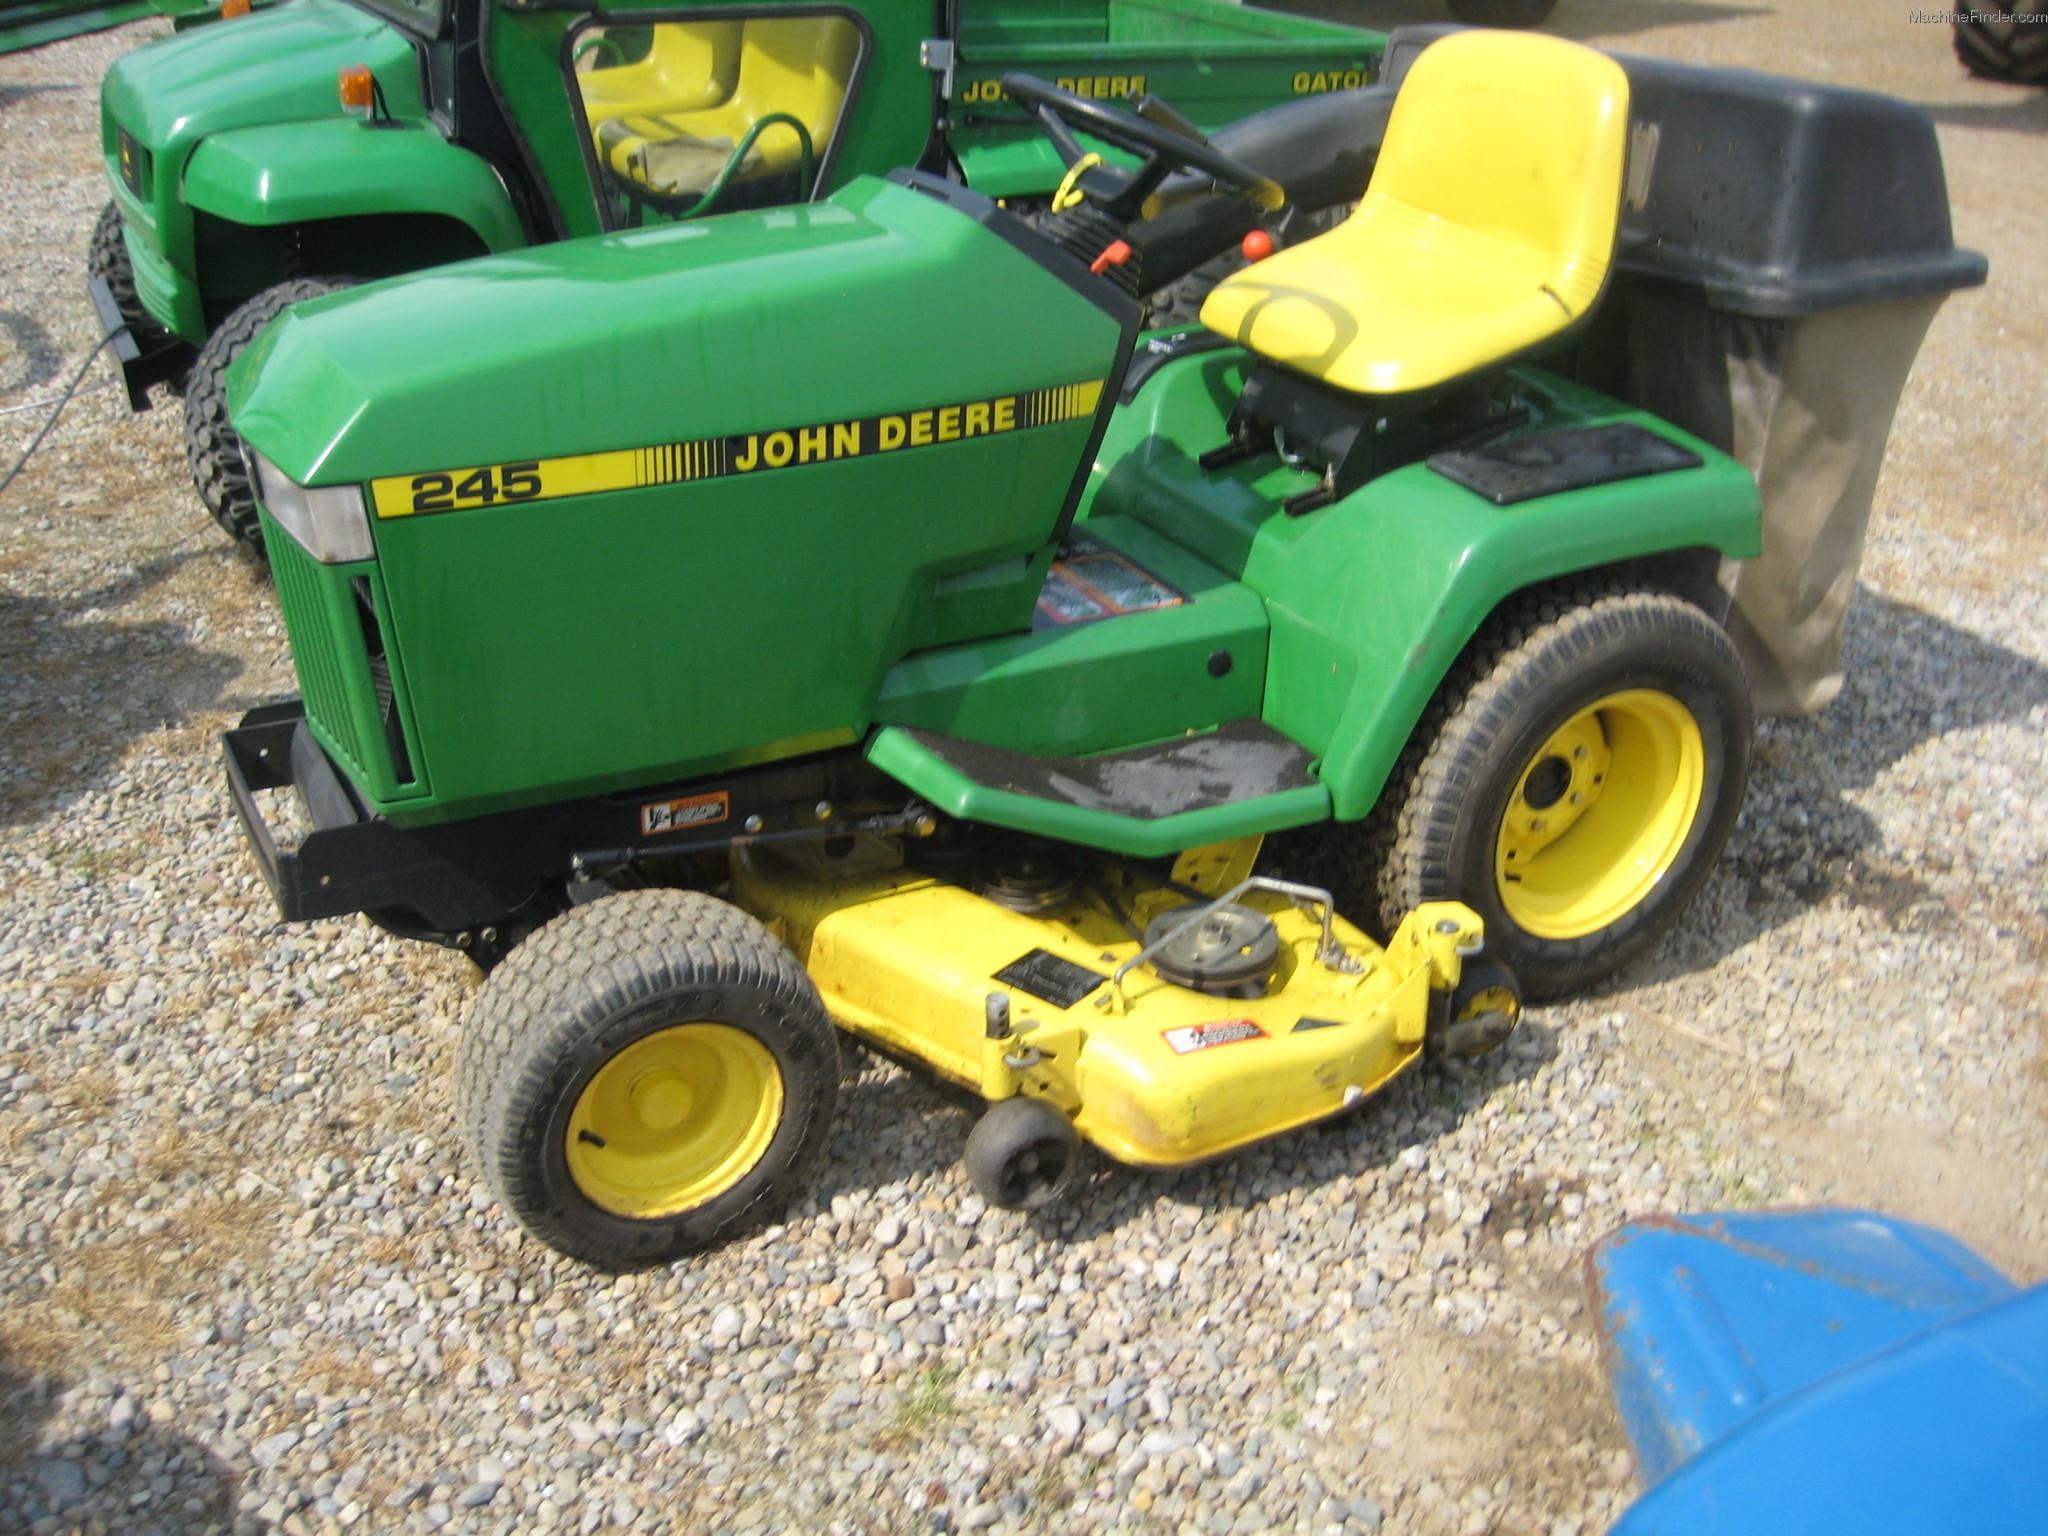 1994 John Deere 245 Lawn & Garden and Commercial Mowing ...